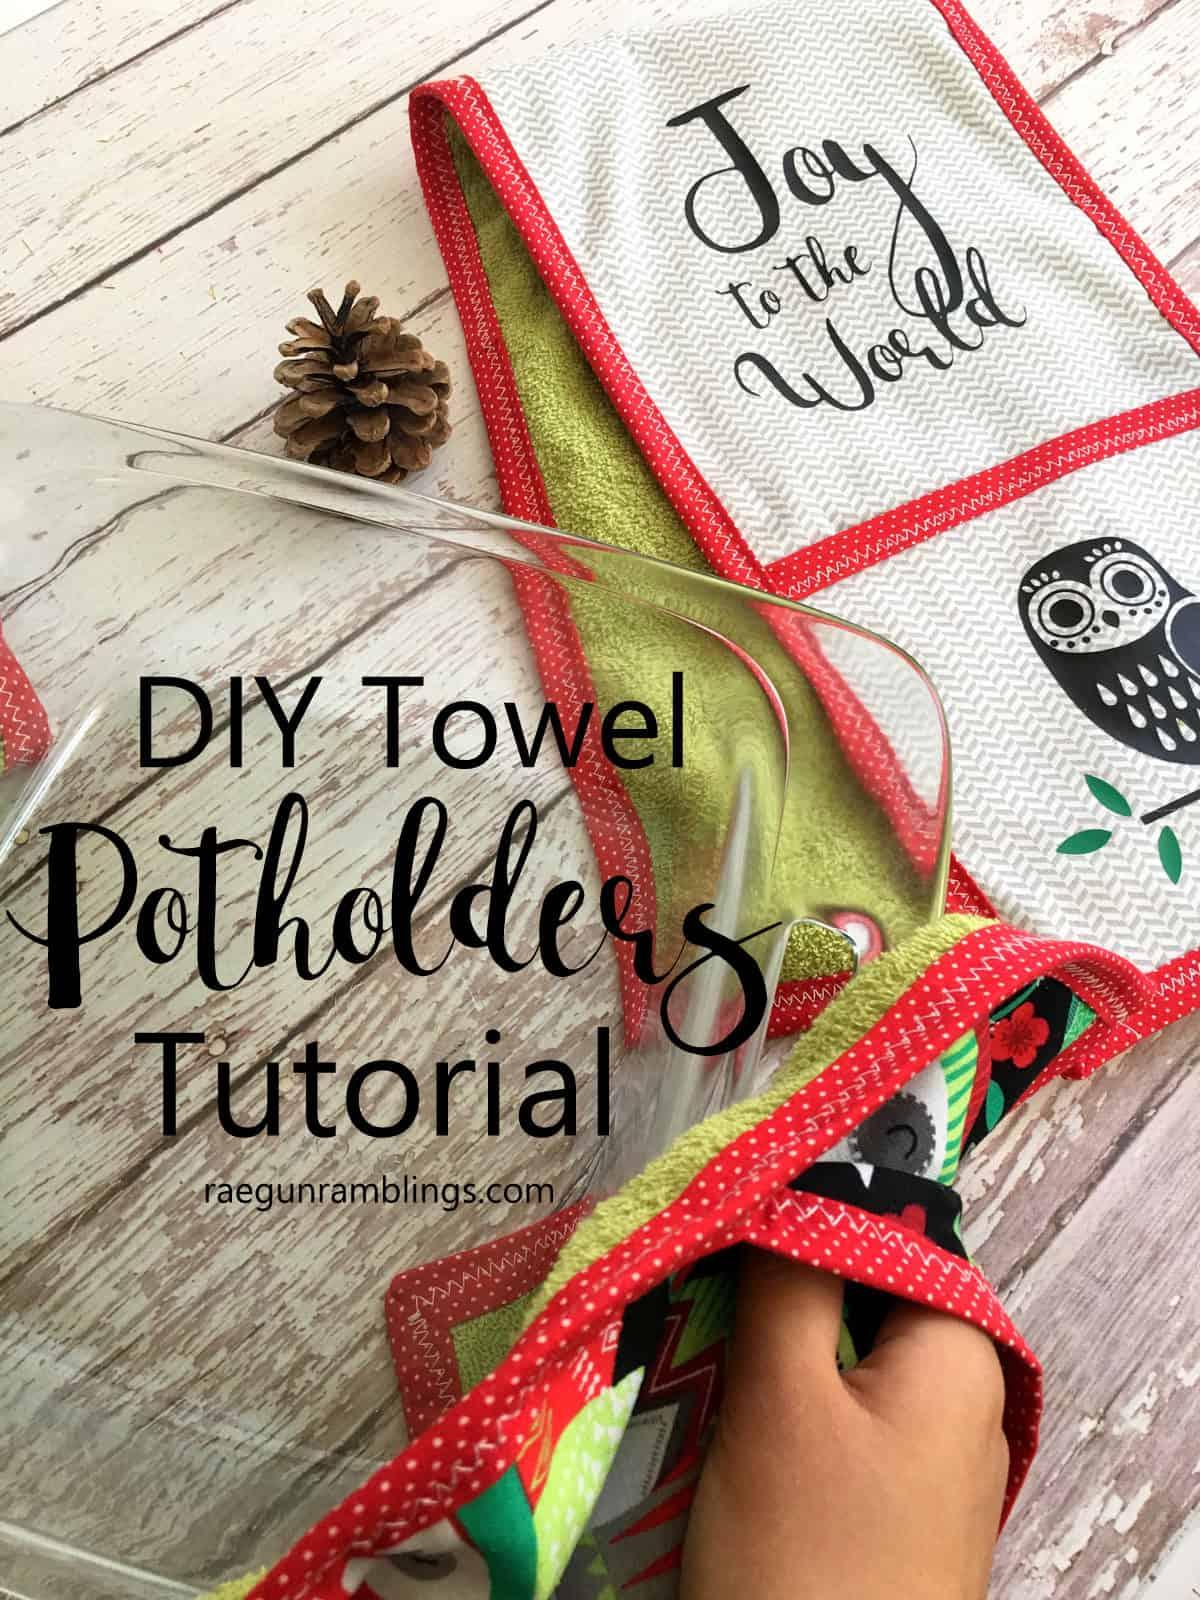 Easy kitchen gift tutorial. Towel potholders.